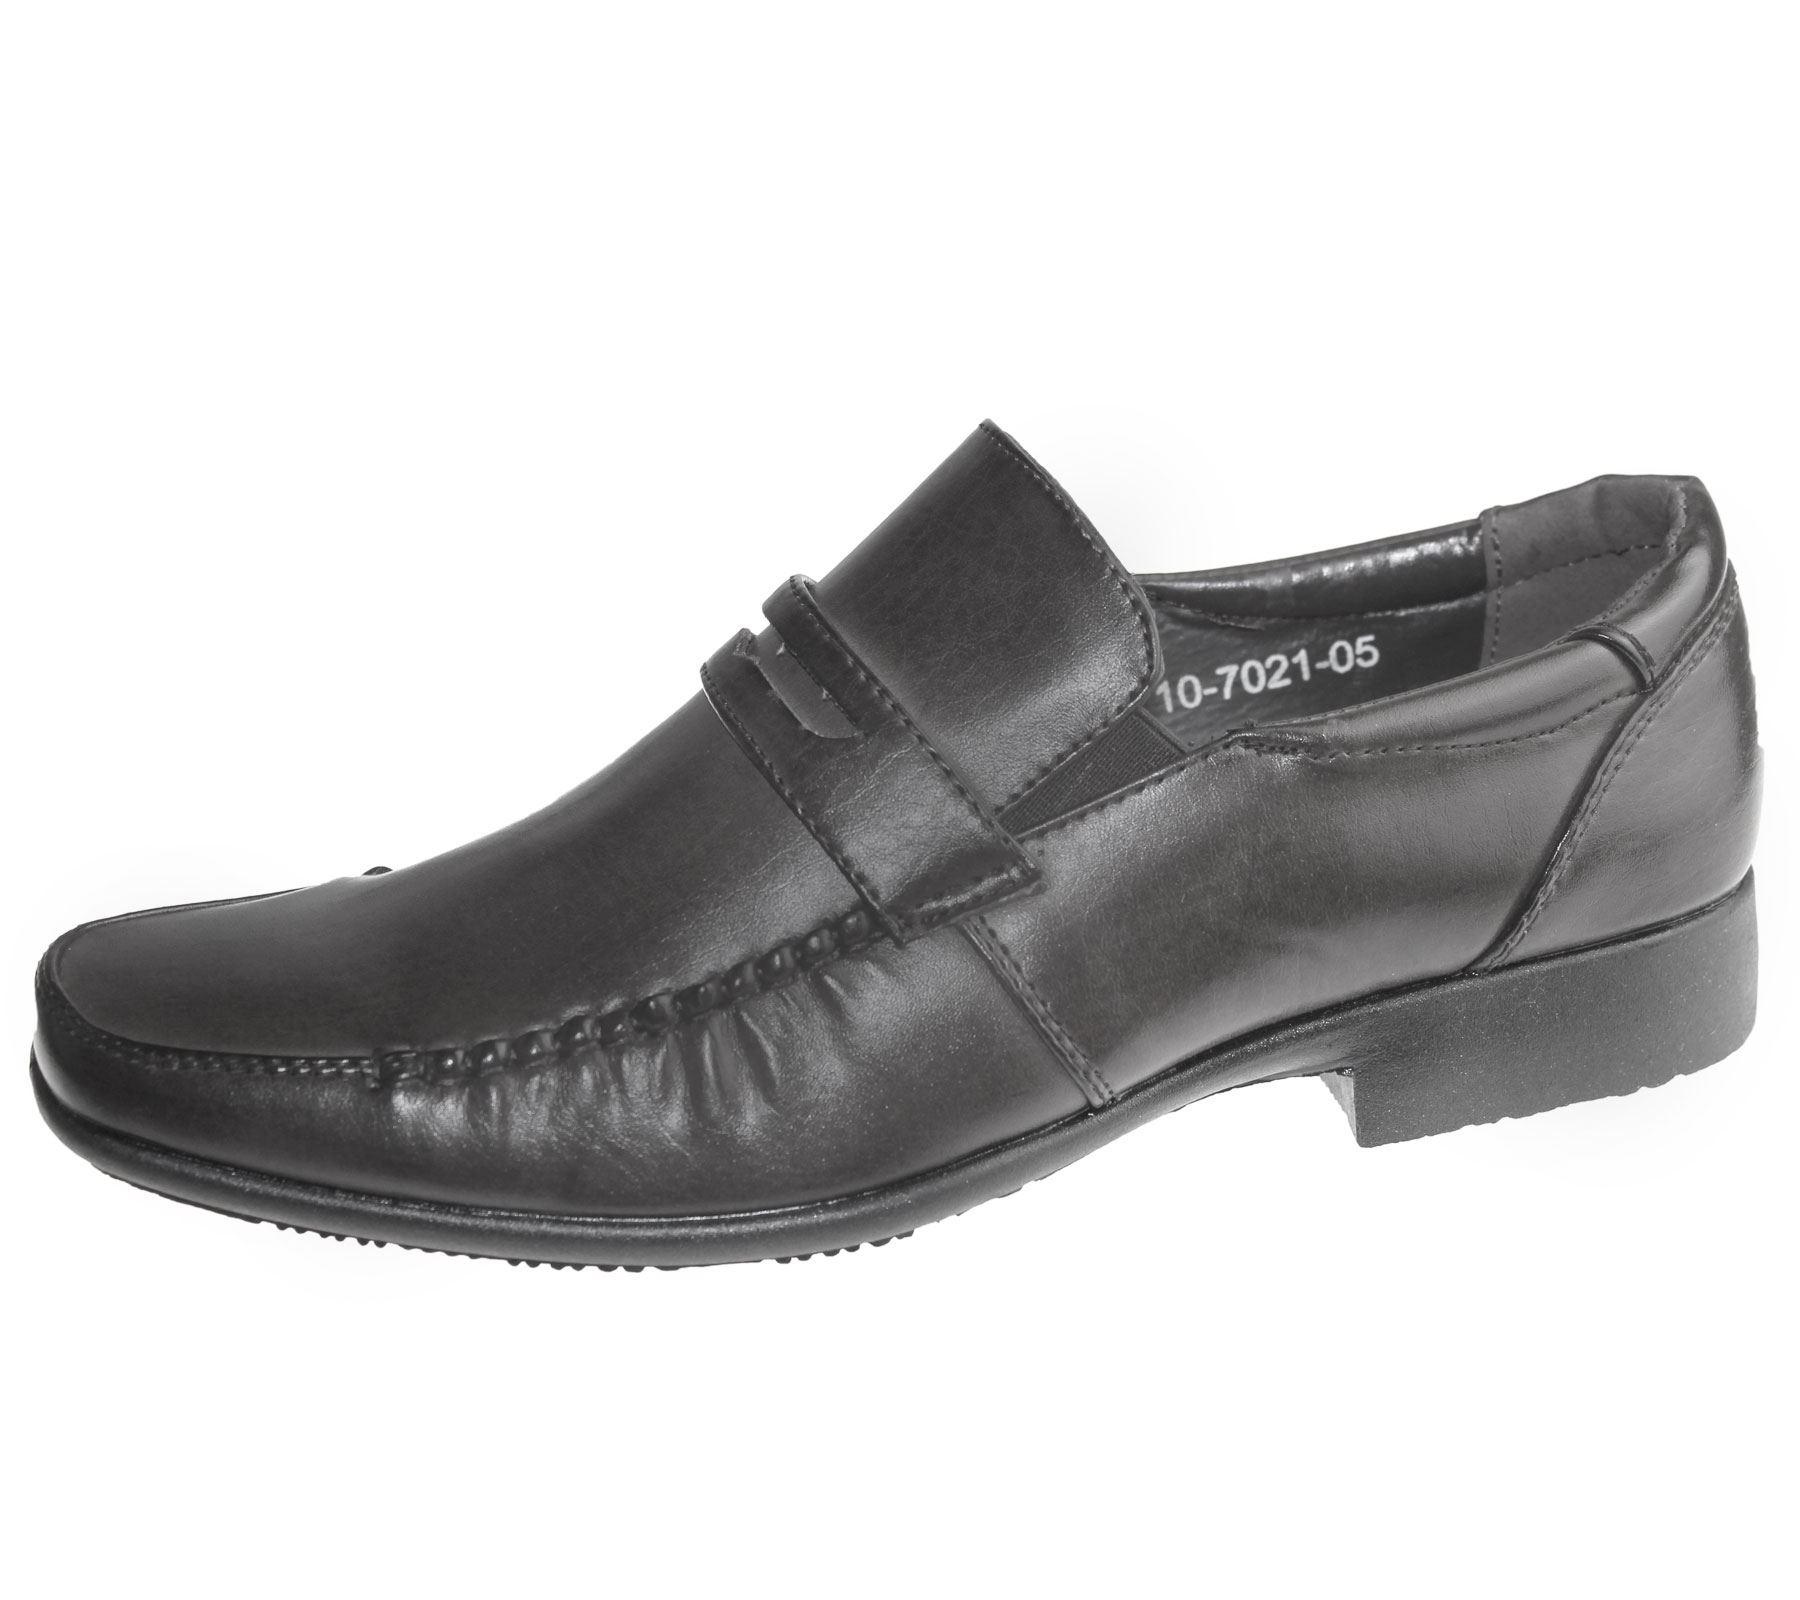 mens office shoes smart wedding italian work casual formal